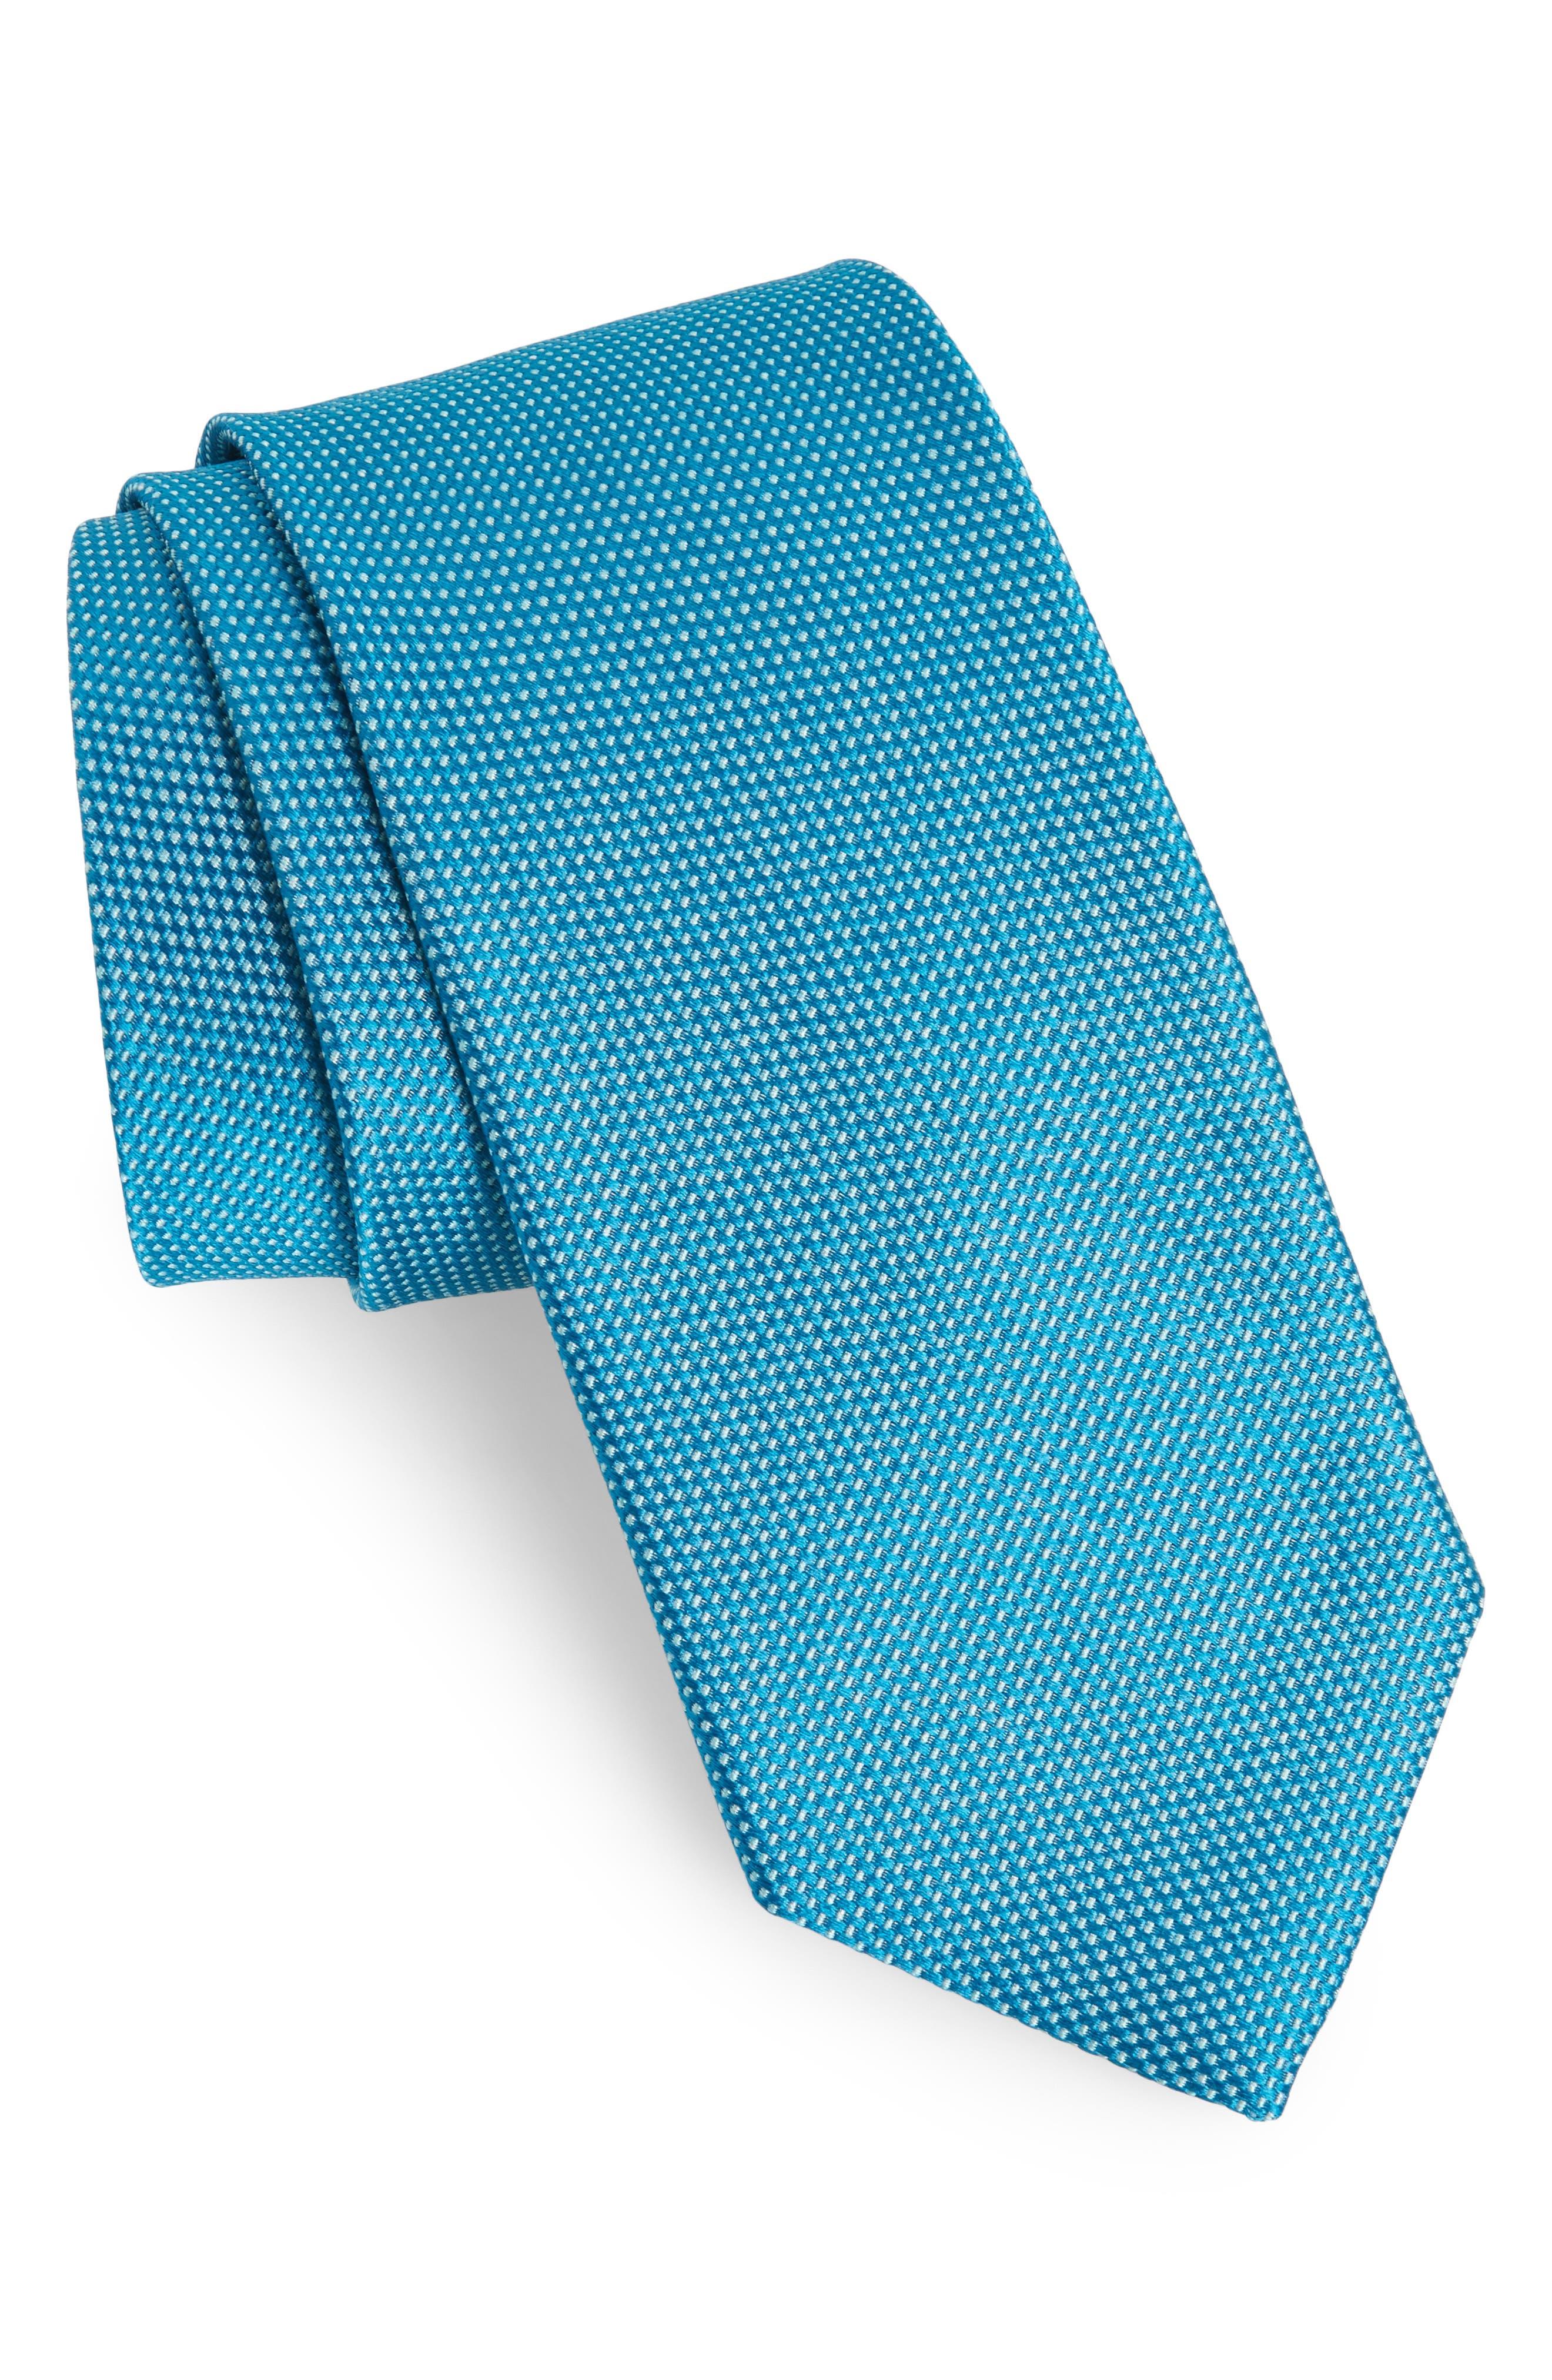 Solid Silk Tie,                         Main,                         color, Scuba Blue